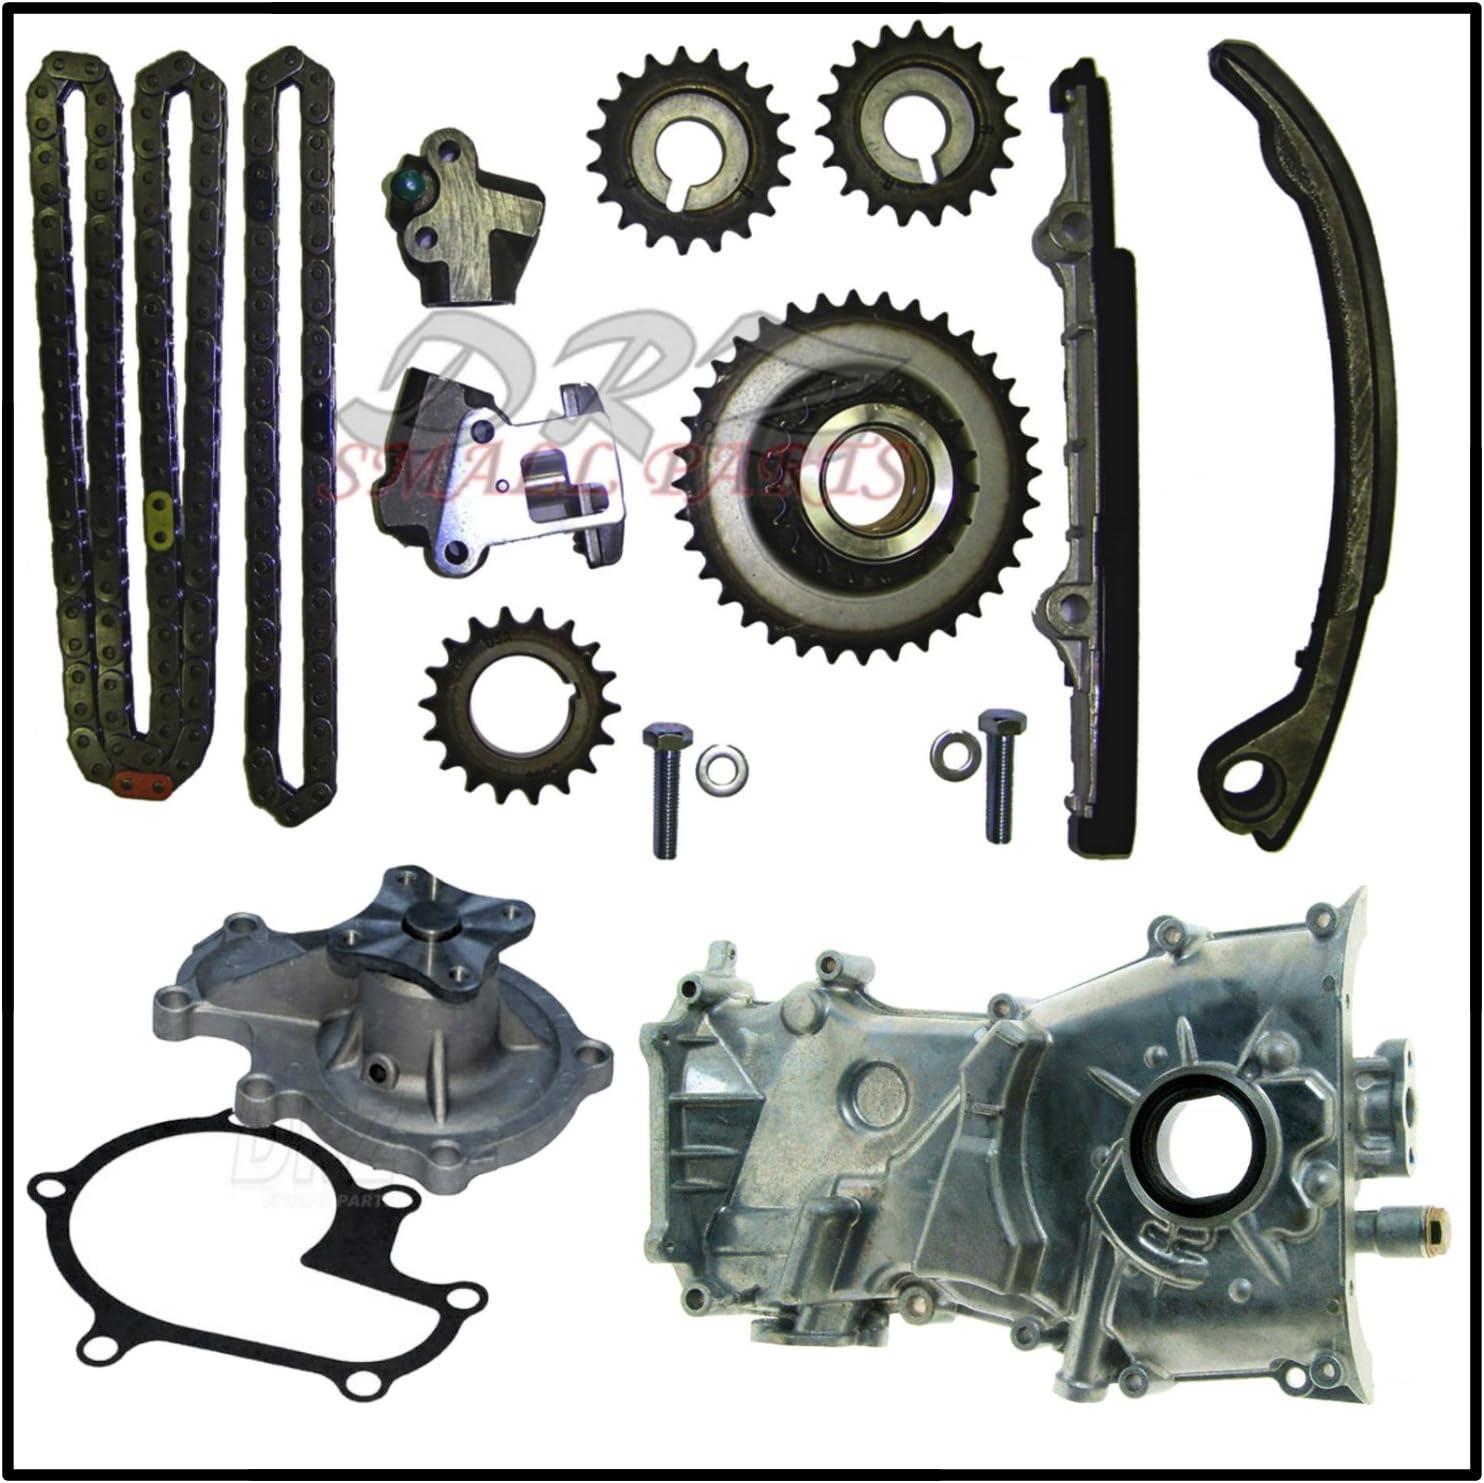 Timing Chain Kit w// Water Oil Pump for 98-01 Nissan Altima 2.4L DOHC KA24DE